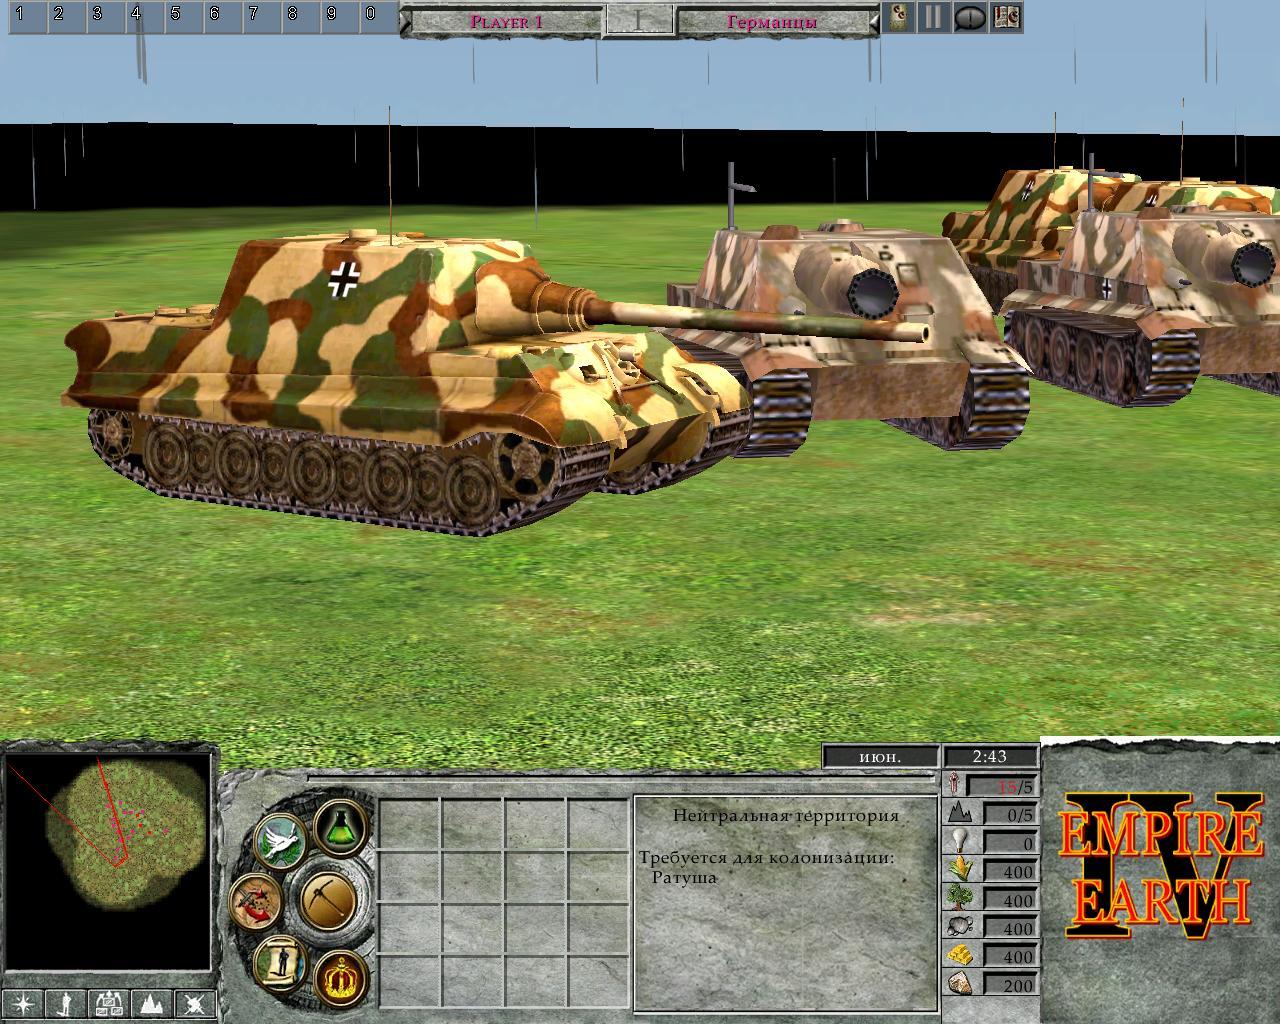 8.0 image - Empire Earth 4 (Mod) v9.0 (English and Russian) for Empire Earth II - Mod DB